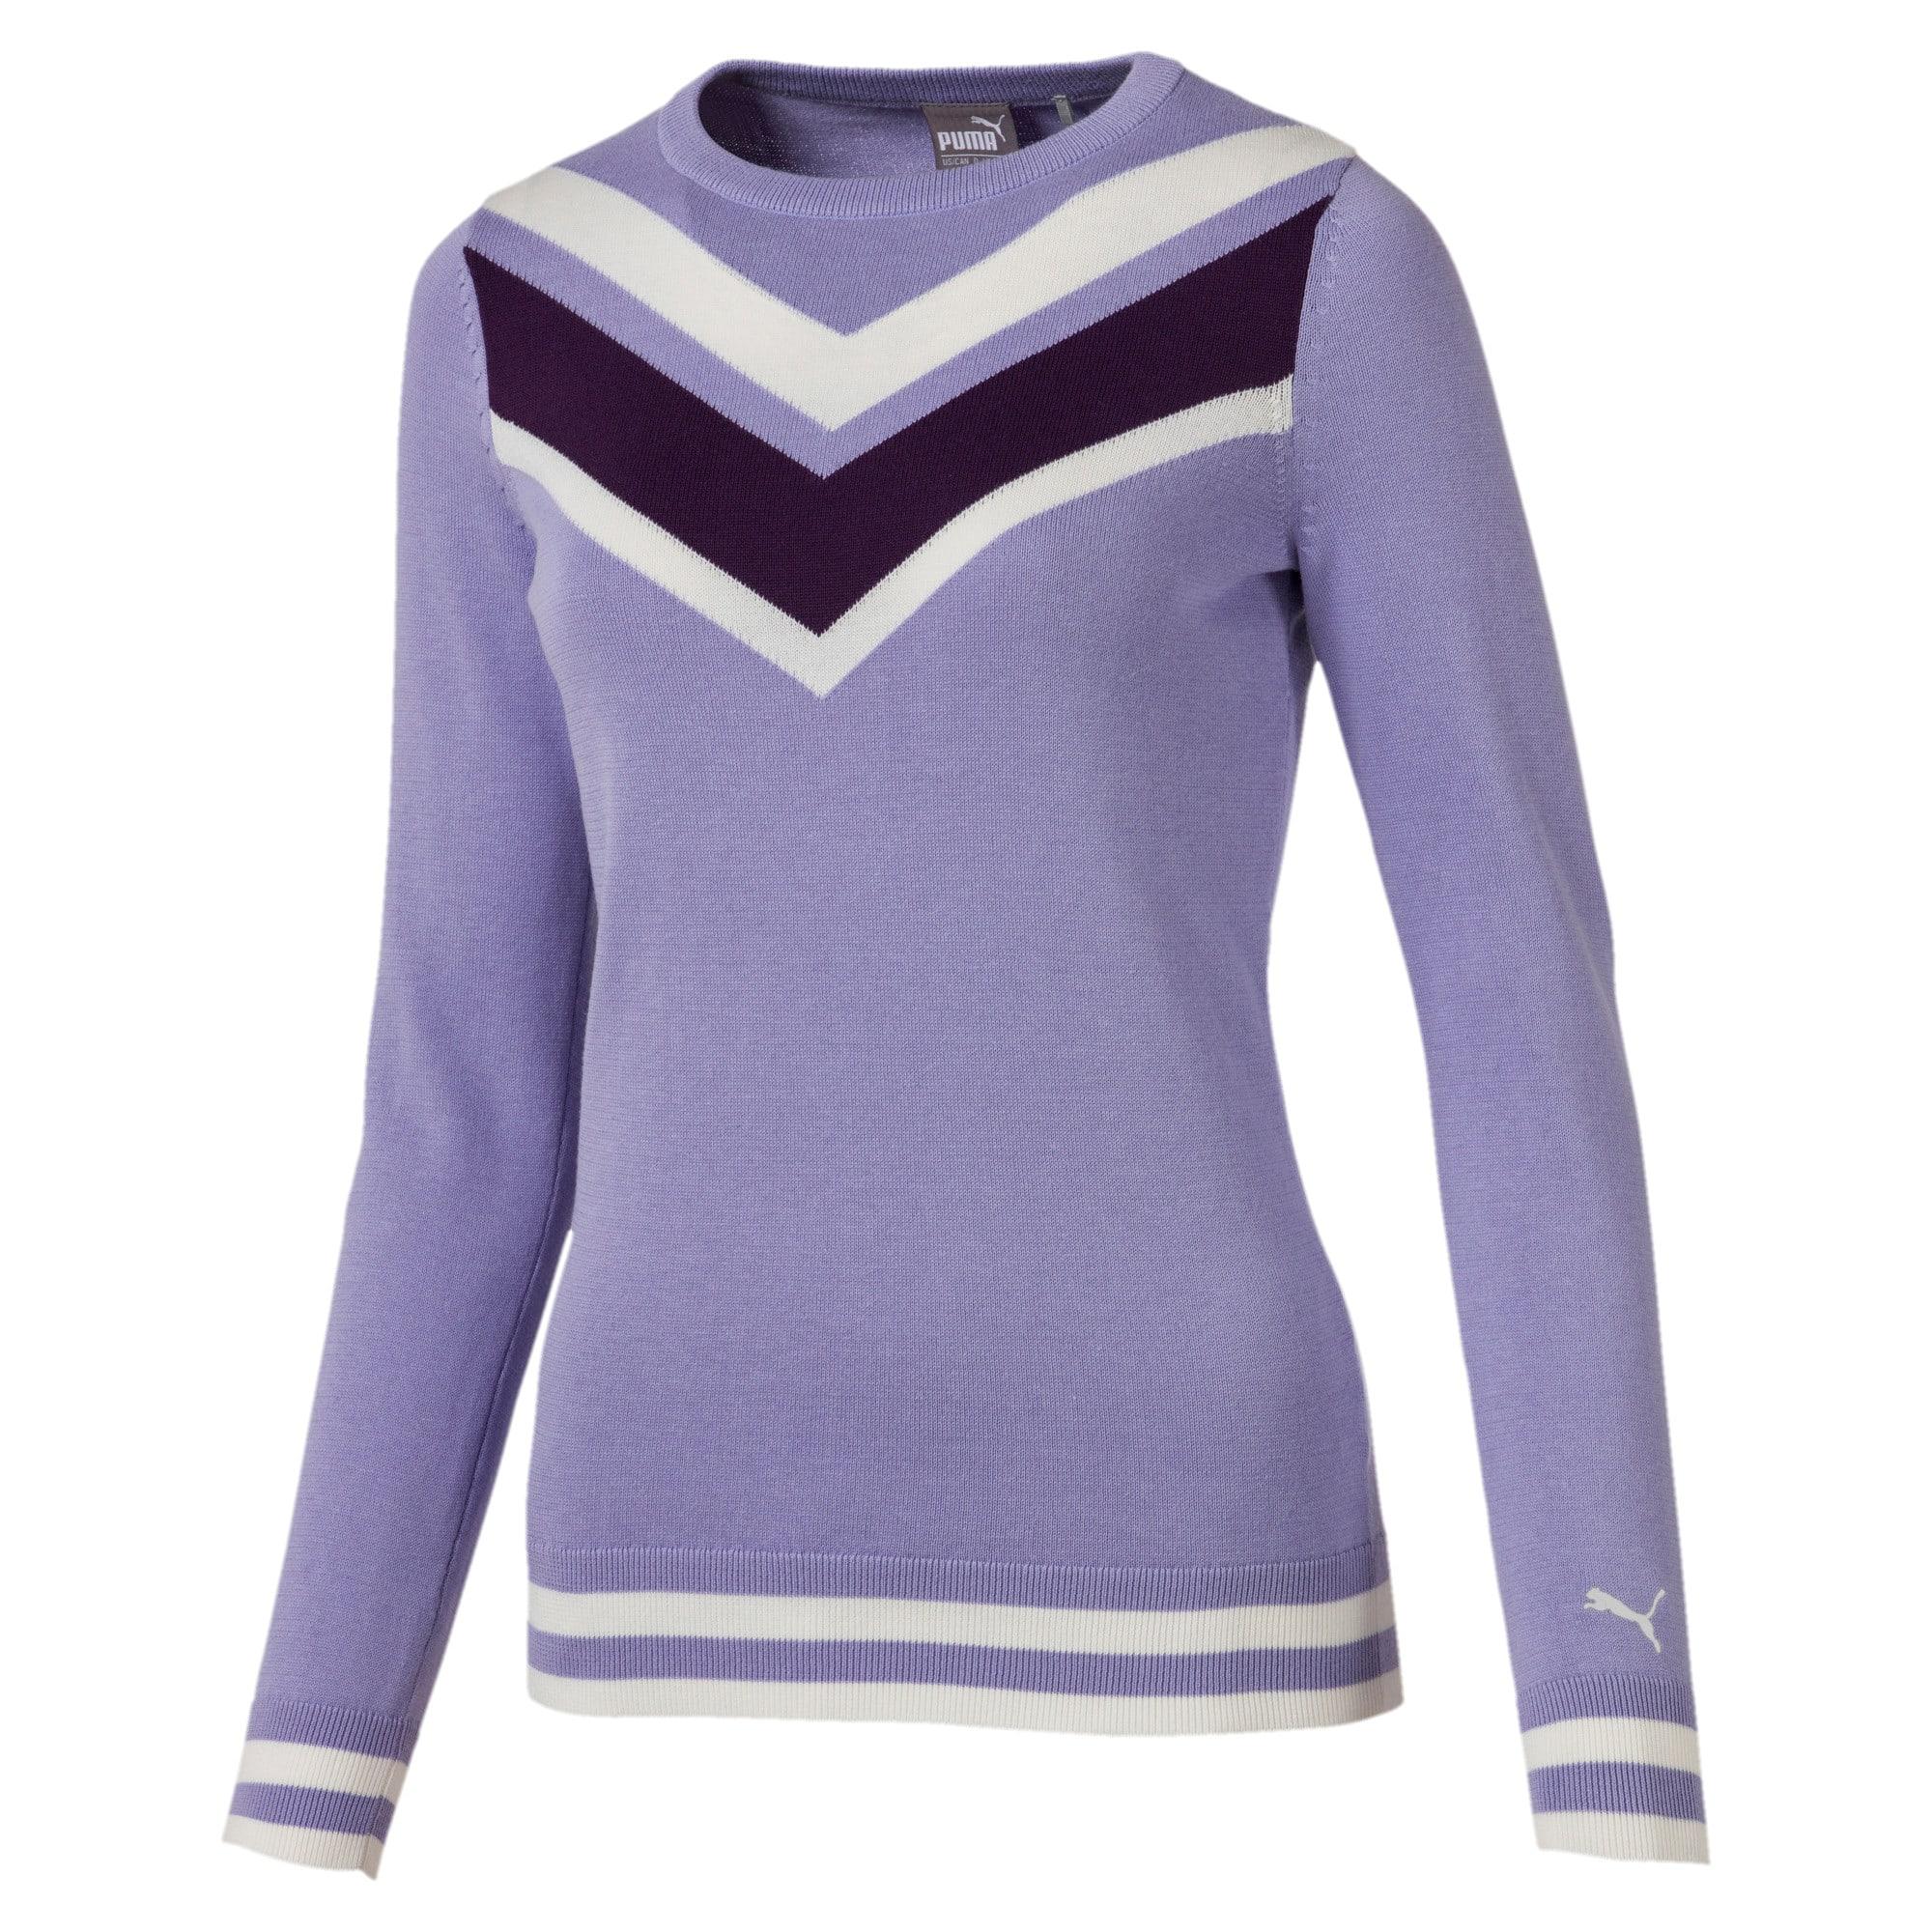 Thumbnail 1 of Chrevron golfsweater voor dames, Sweet Lavender, medium